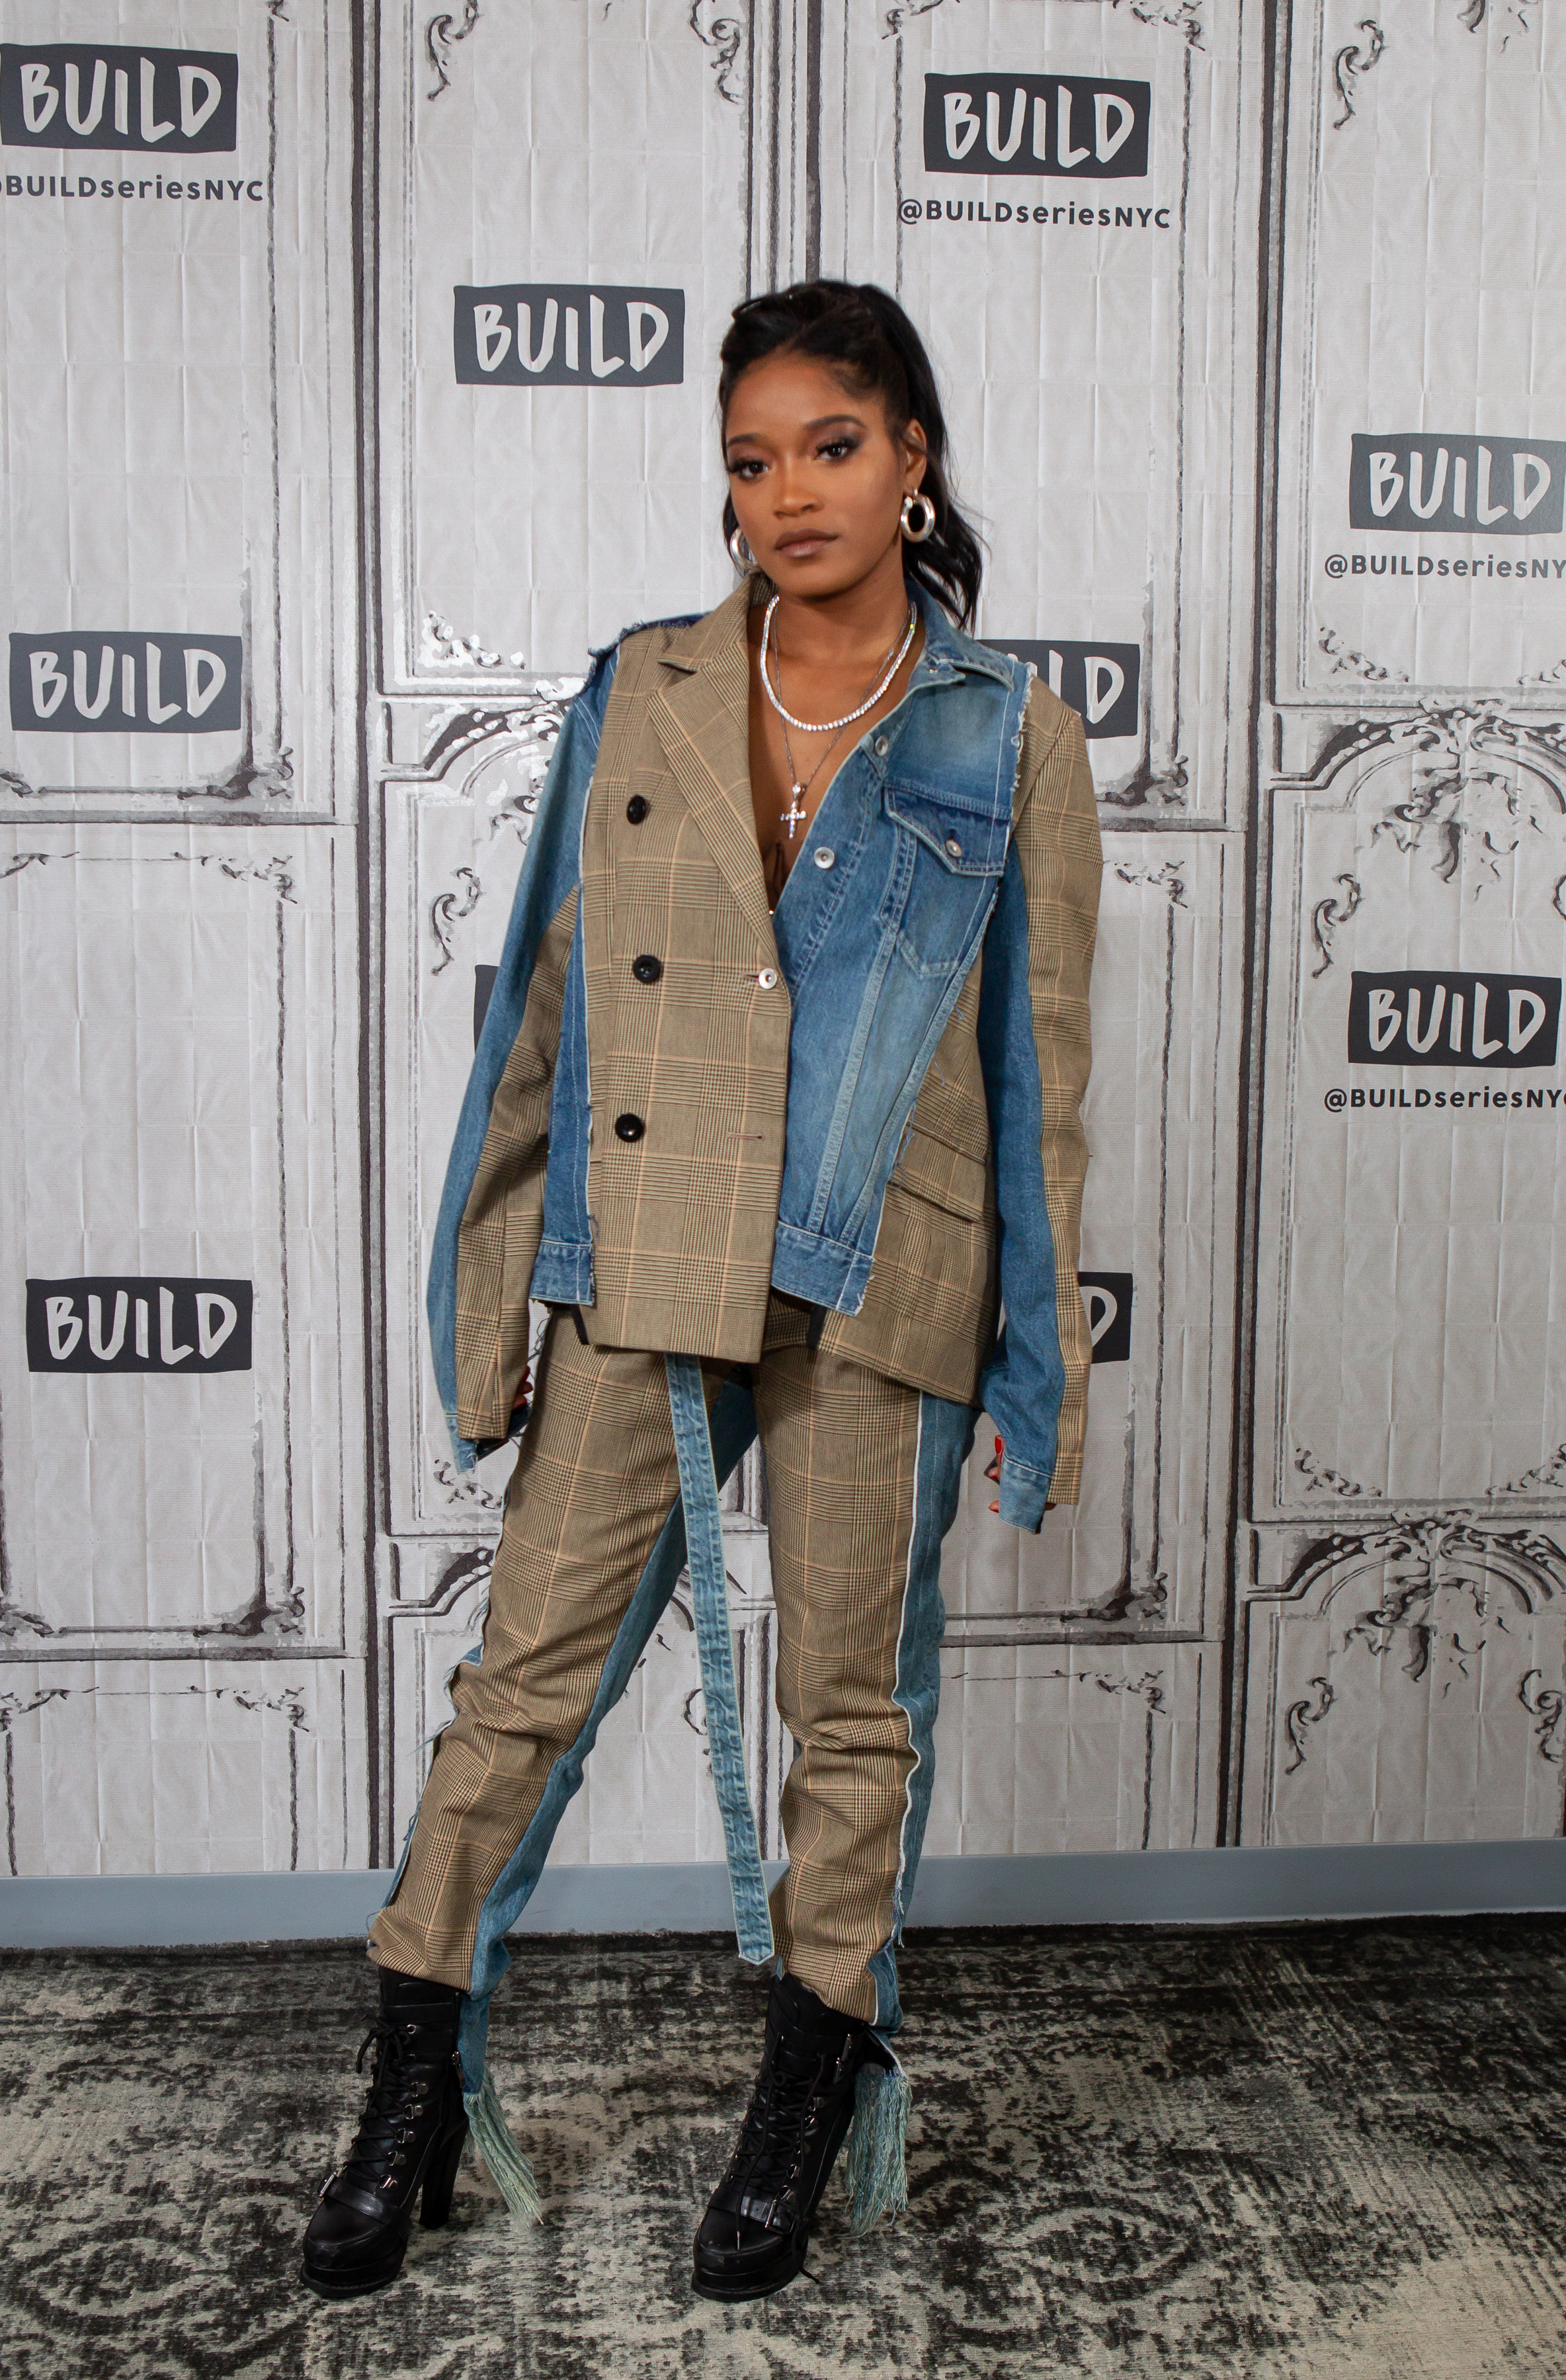 Celebrities Visit Build - February 7, 2019